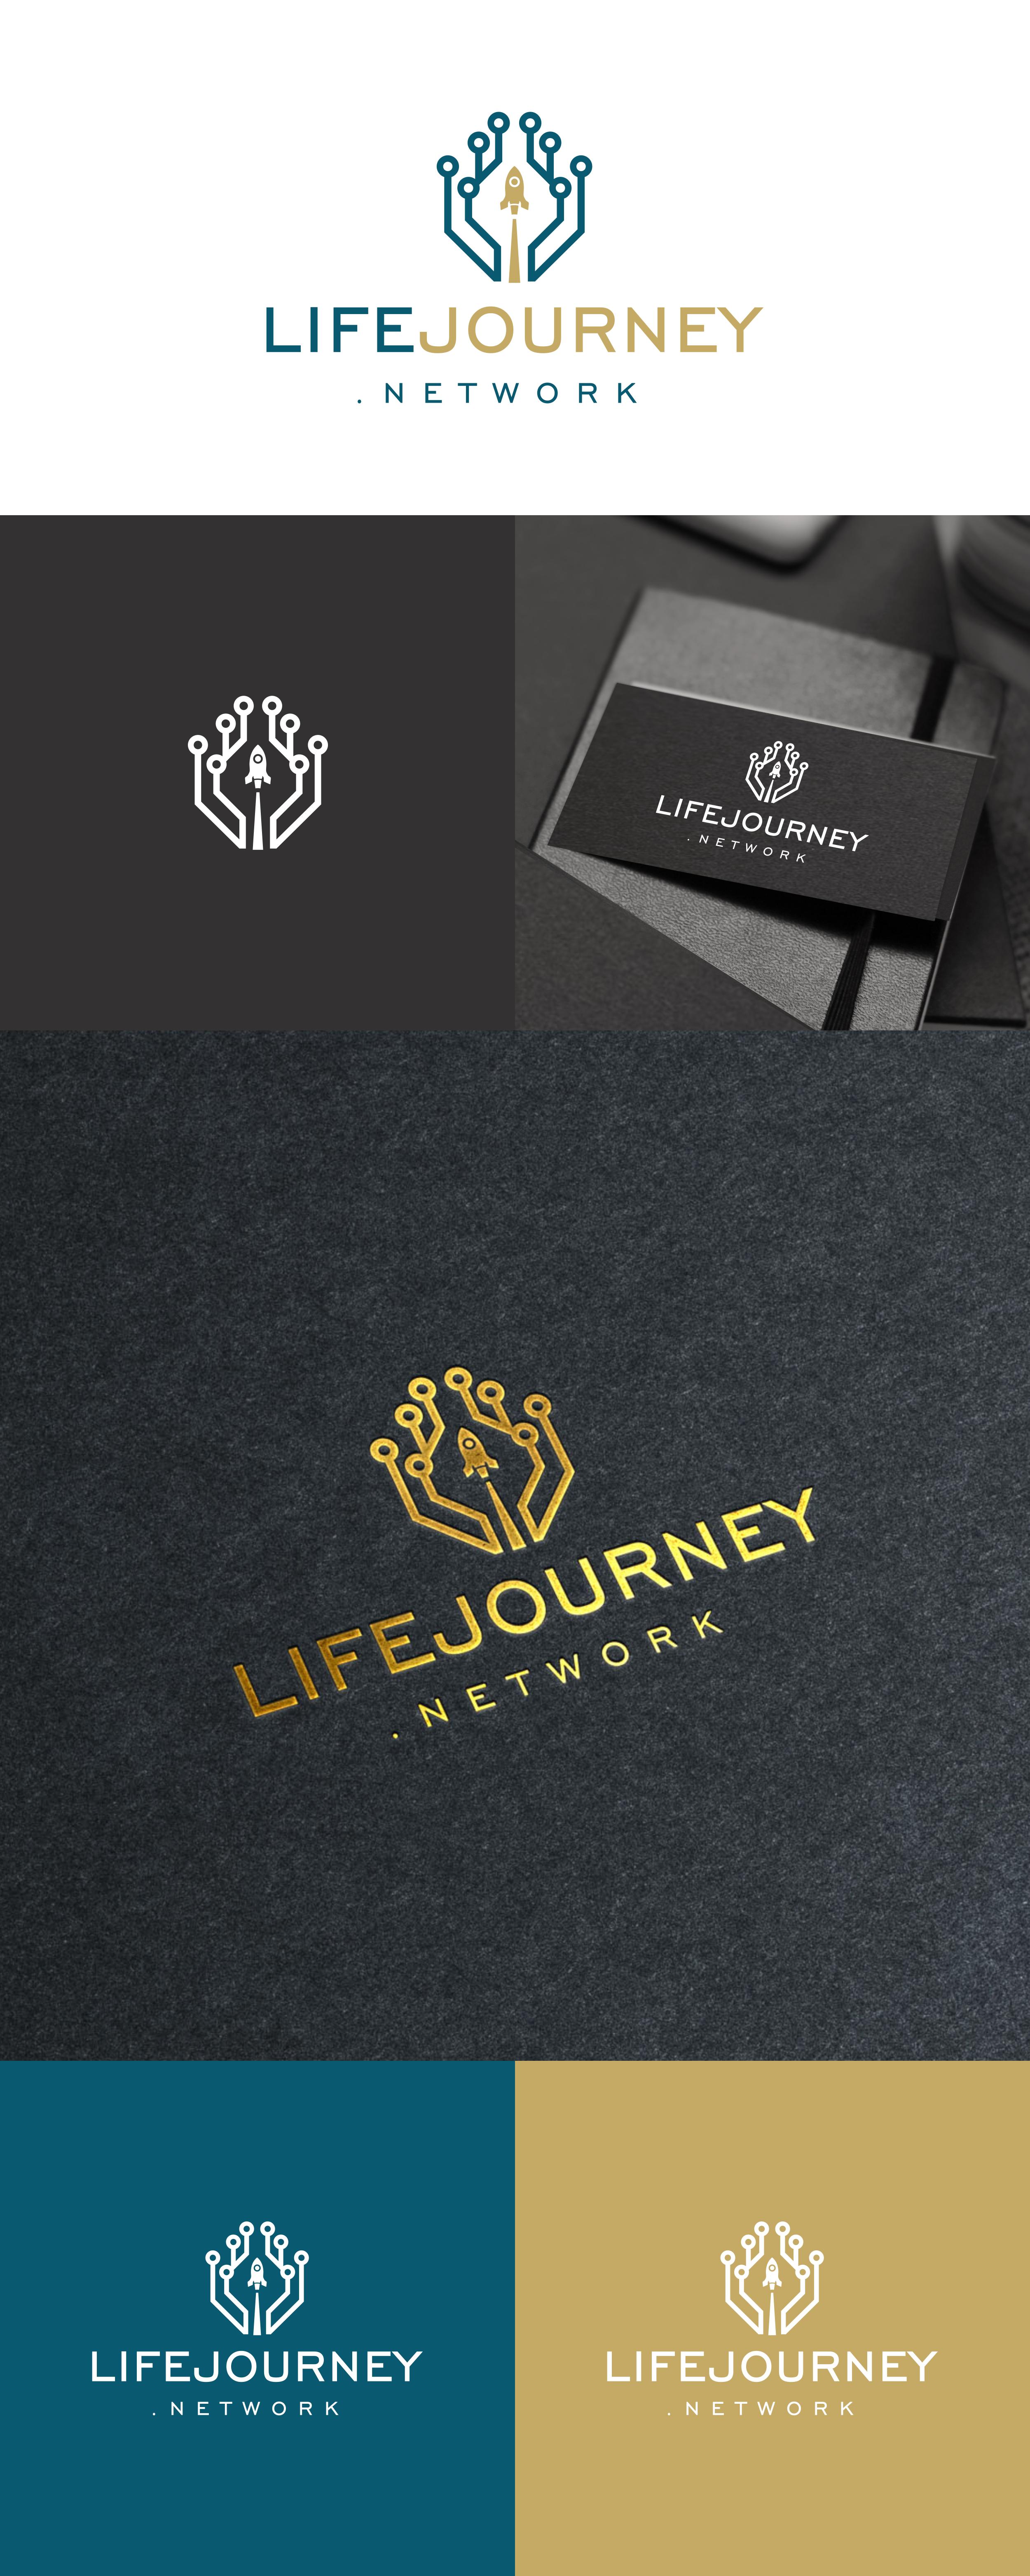 """POSITIVITY.TRAVEL.FINANCIALFREEDOM""- !Design a logo which follow us around the globe!"